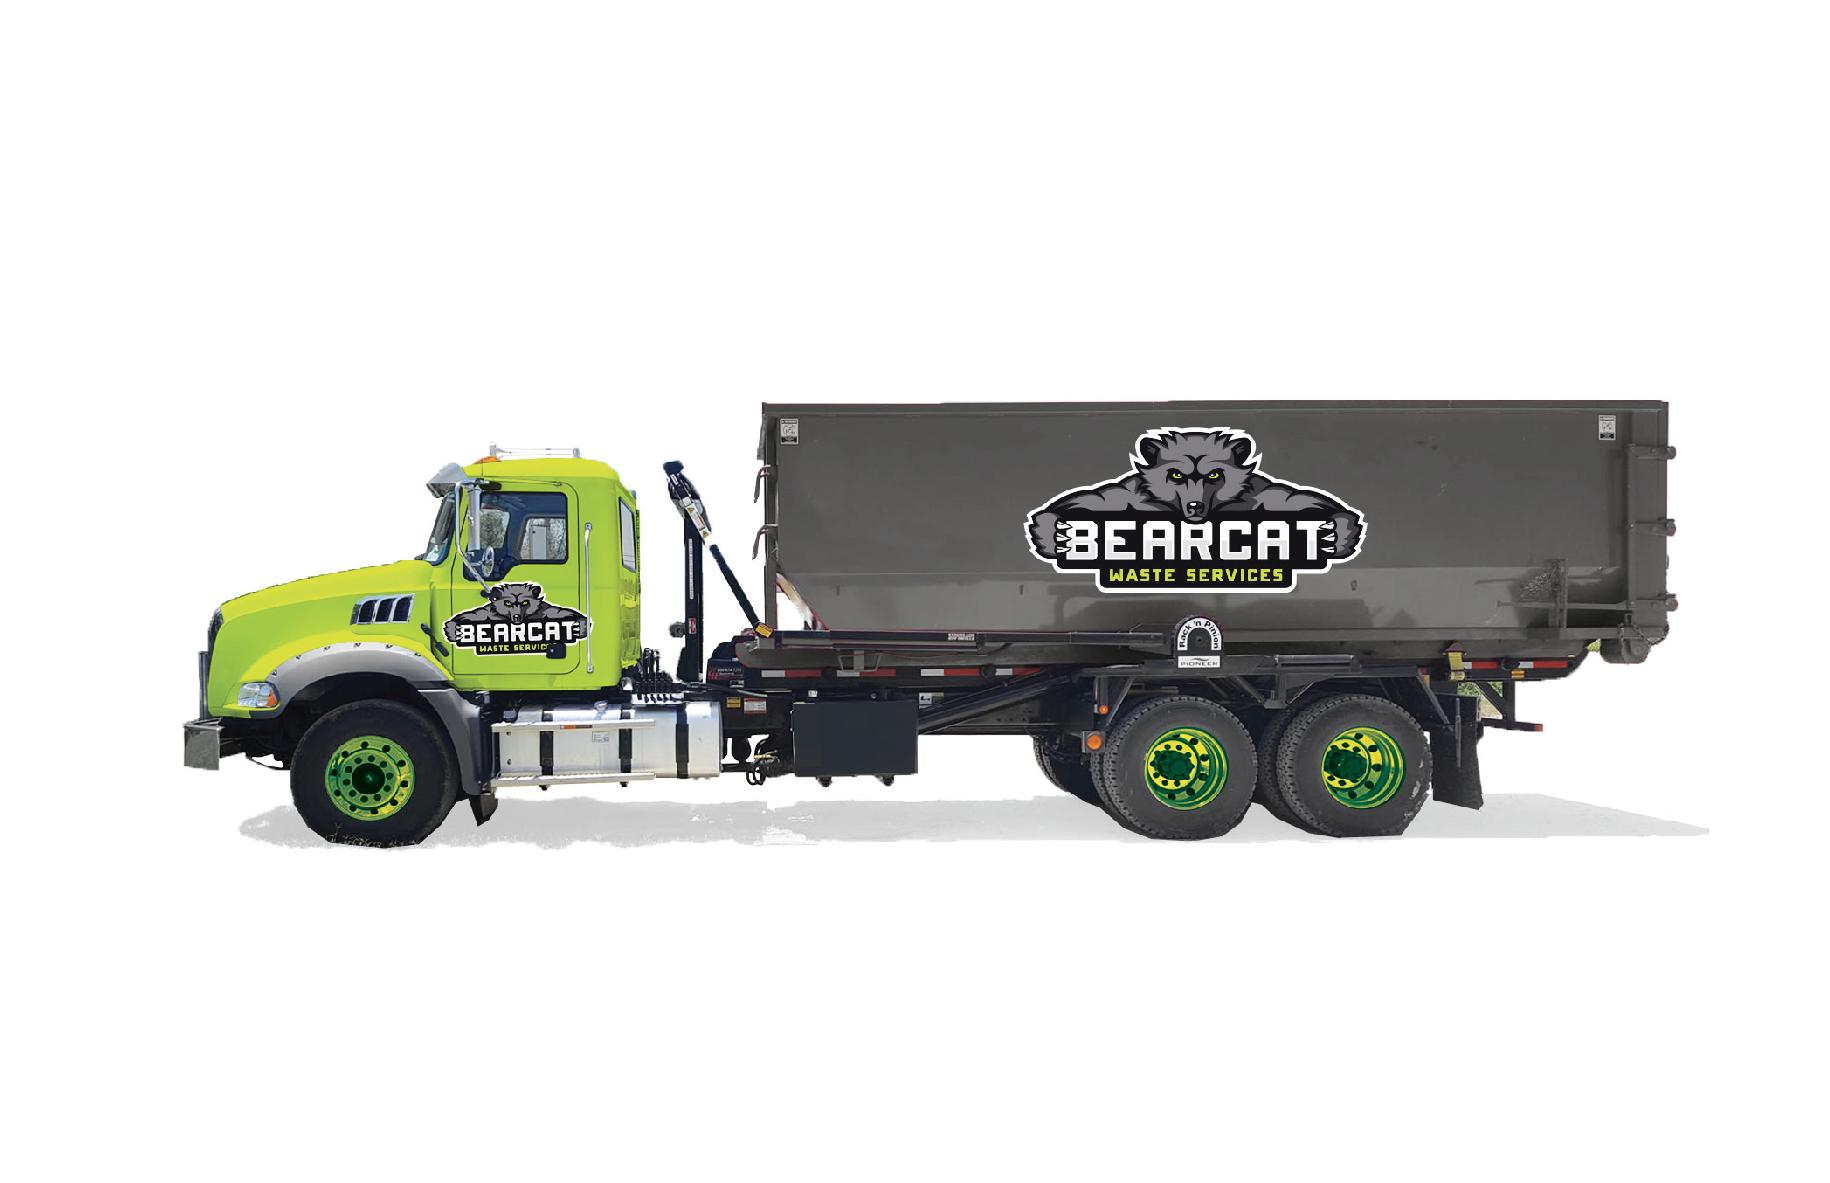 Bearcat-logo-presentation-layout-D-round1-truck.png